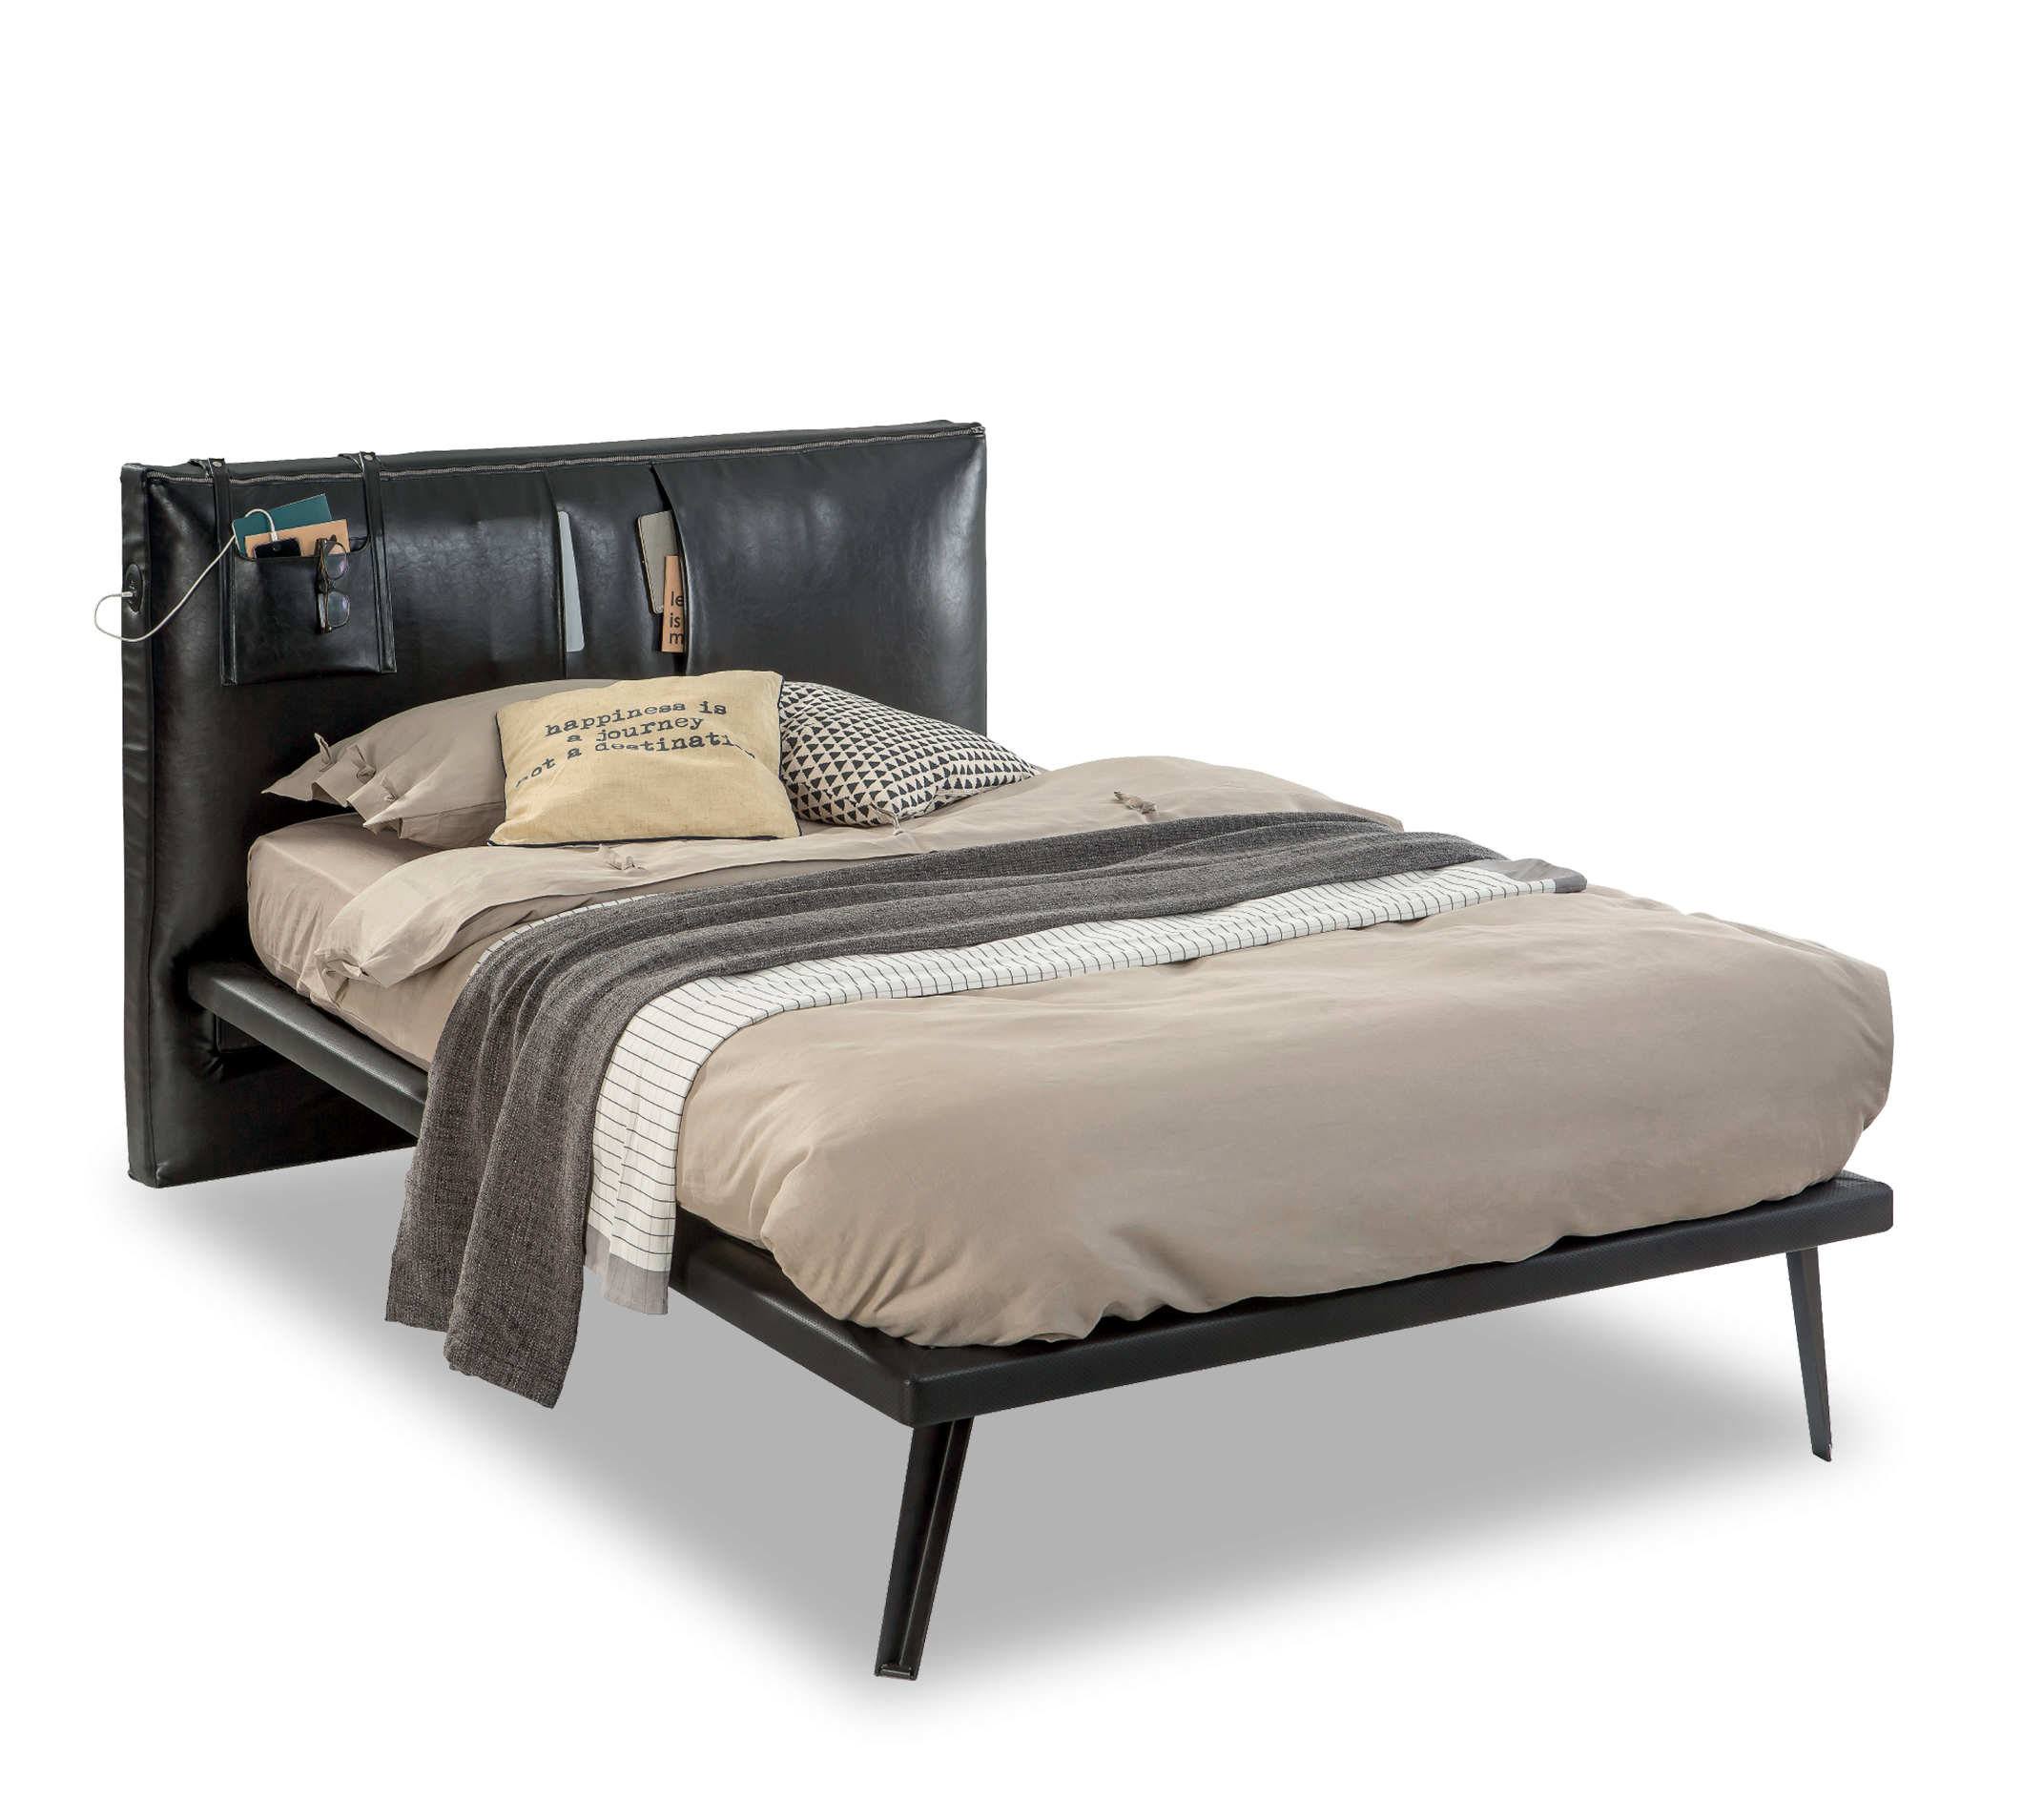 Full Size of Dark Metal Bett 120x200 Cm Lek Französische Betten Wohnwert Ruf Fabrikverkauf Innocent Möbel Boss Luxus Jugend Kaufen 140x200 Ikea 160x200 90x200 Aus Holz Bett Betten 120x200